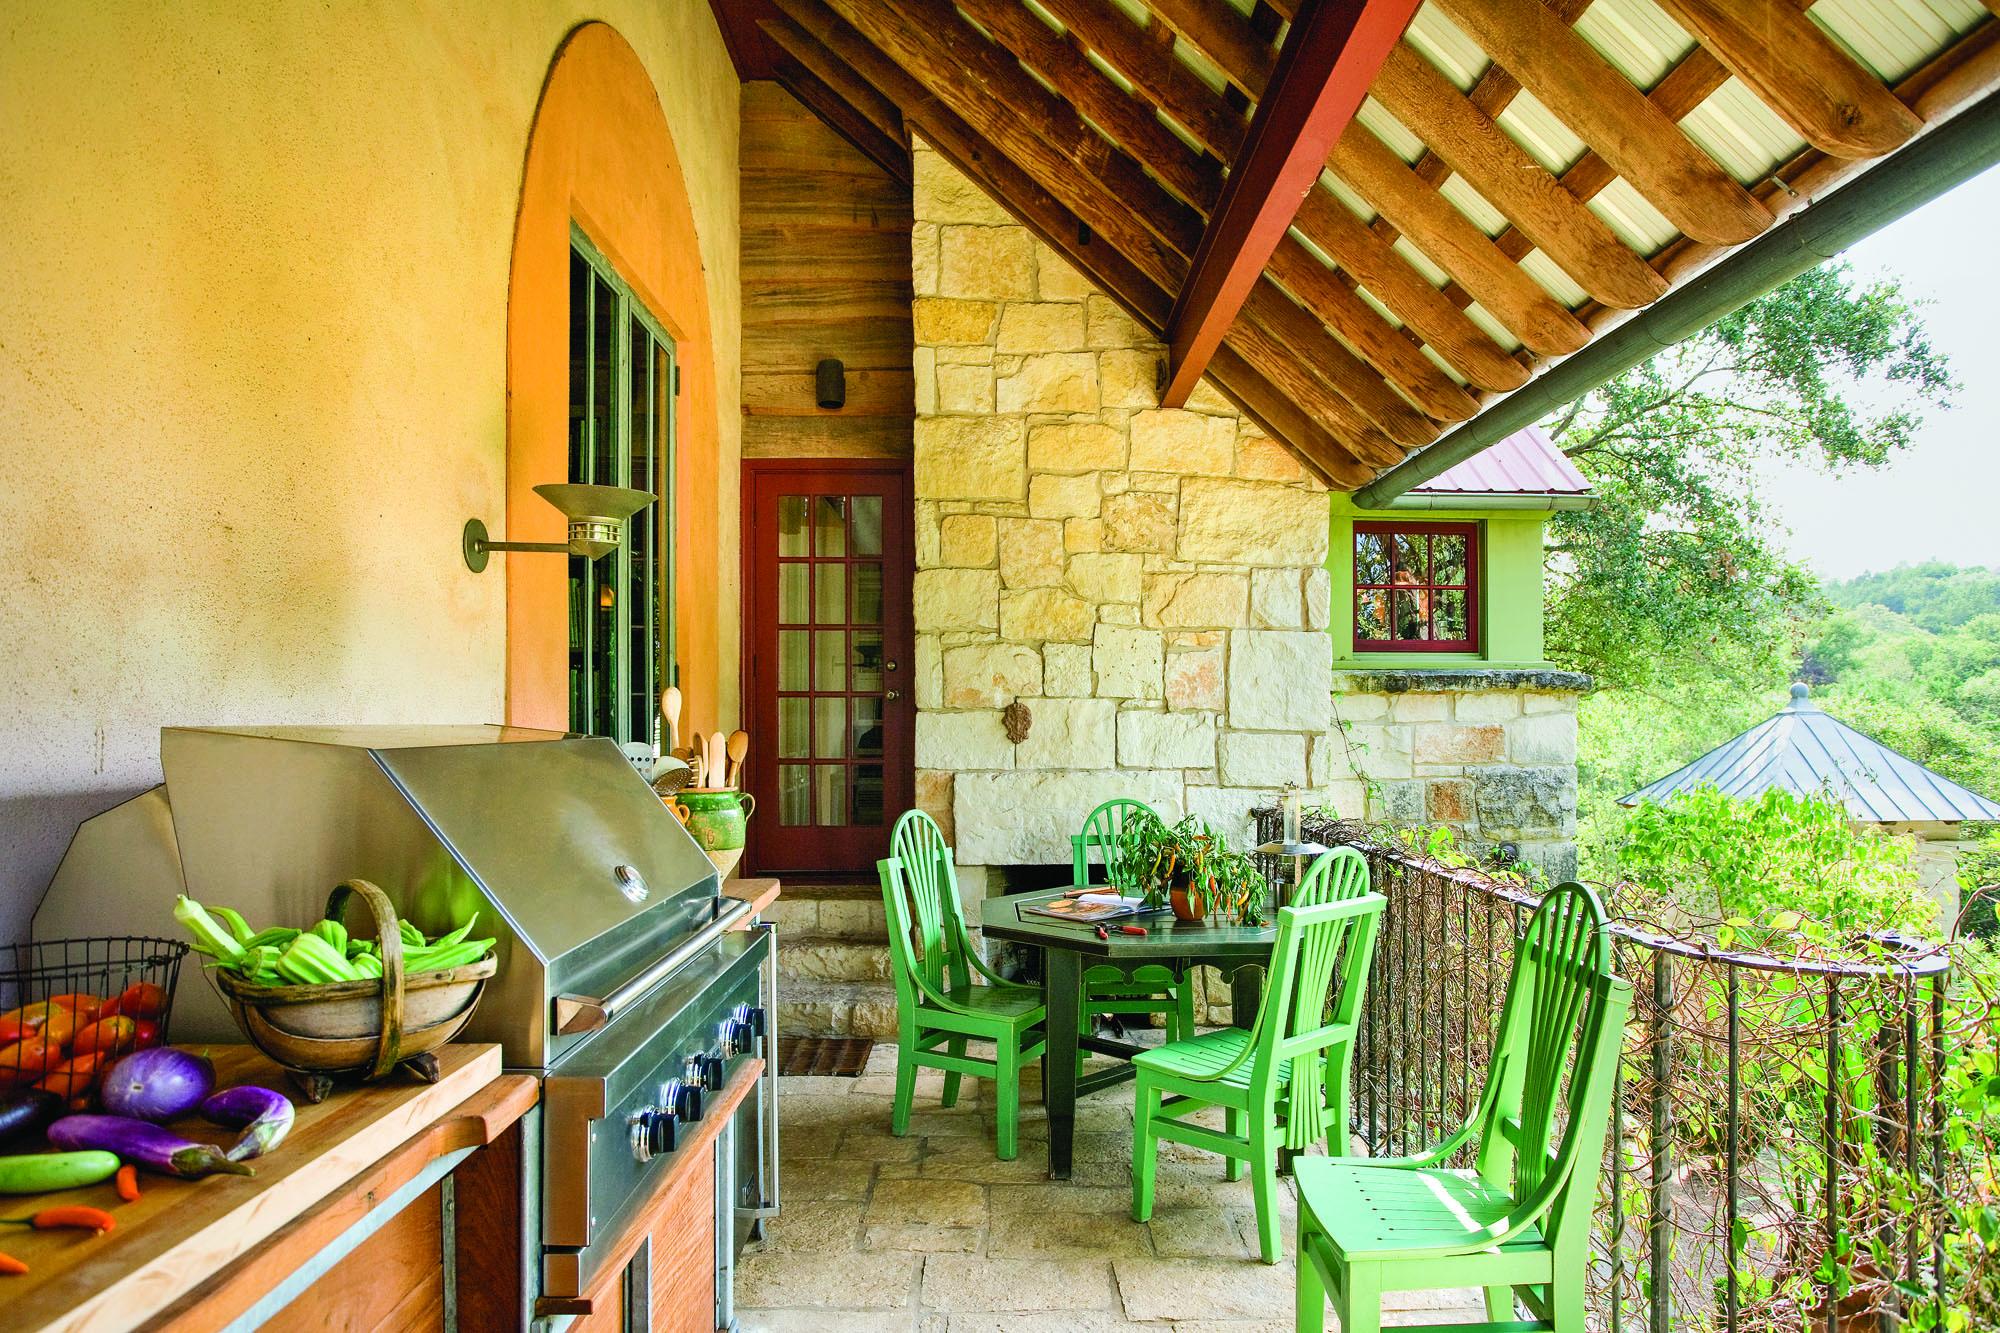 Kitchen Decor Green Walls